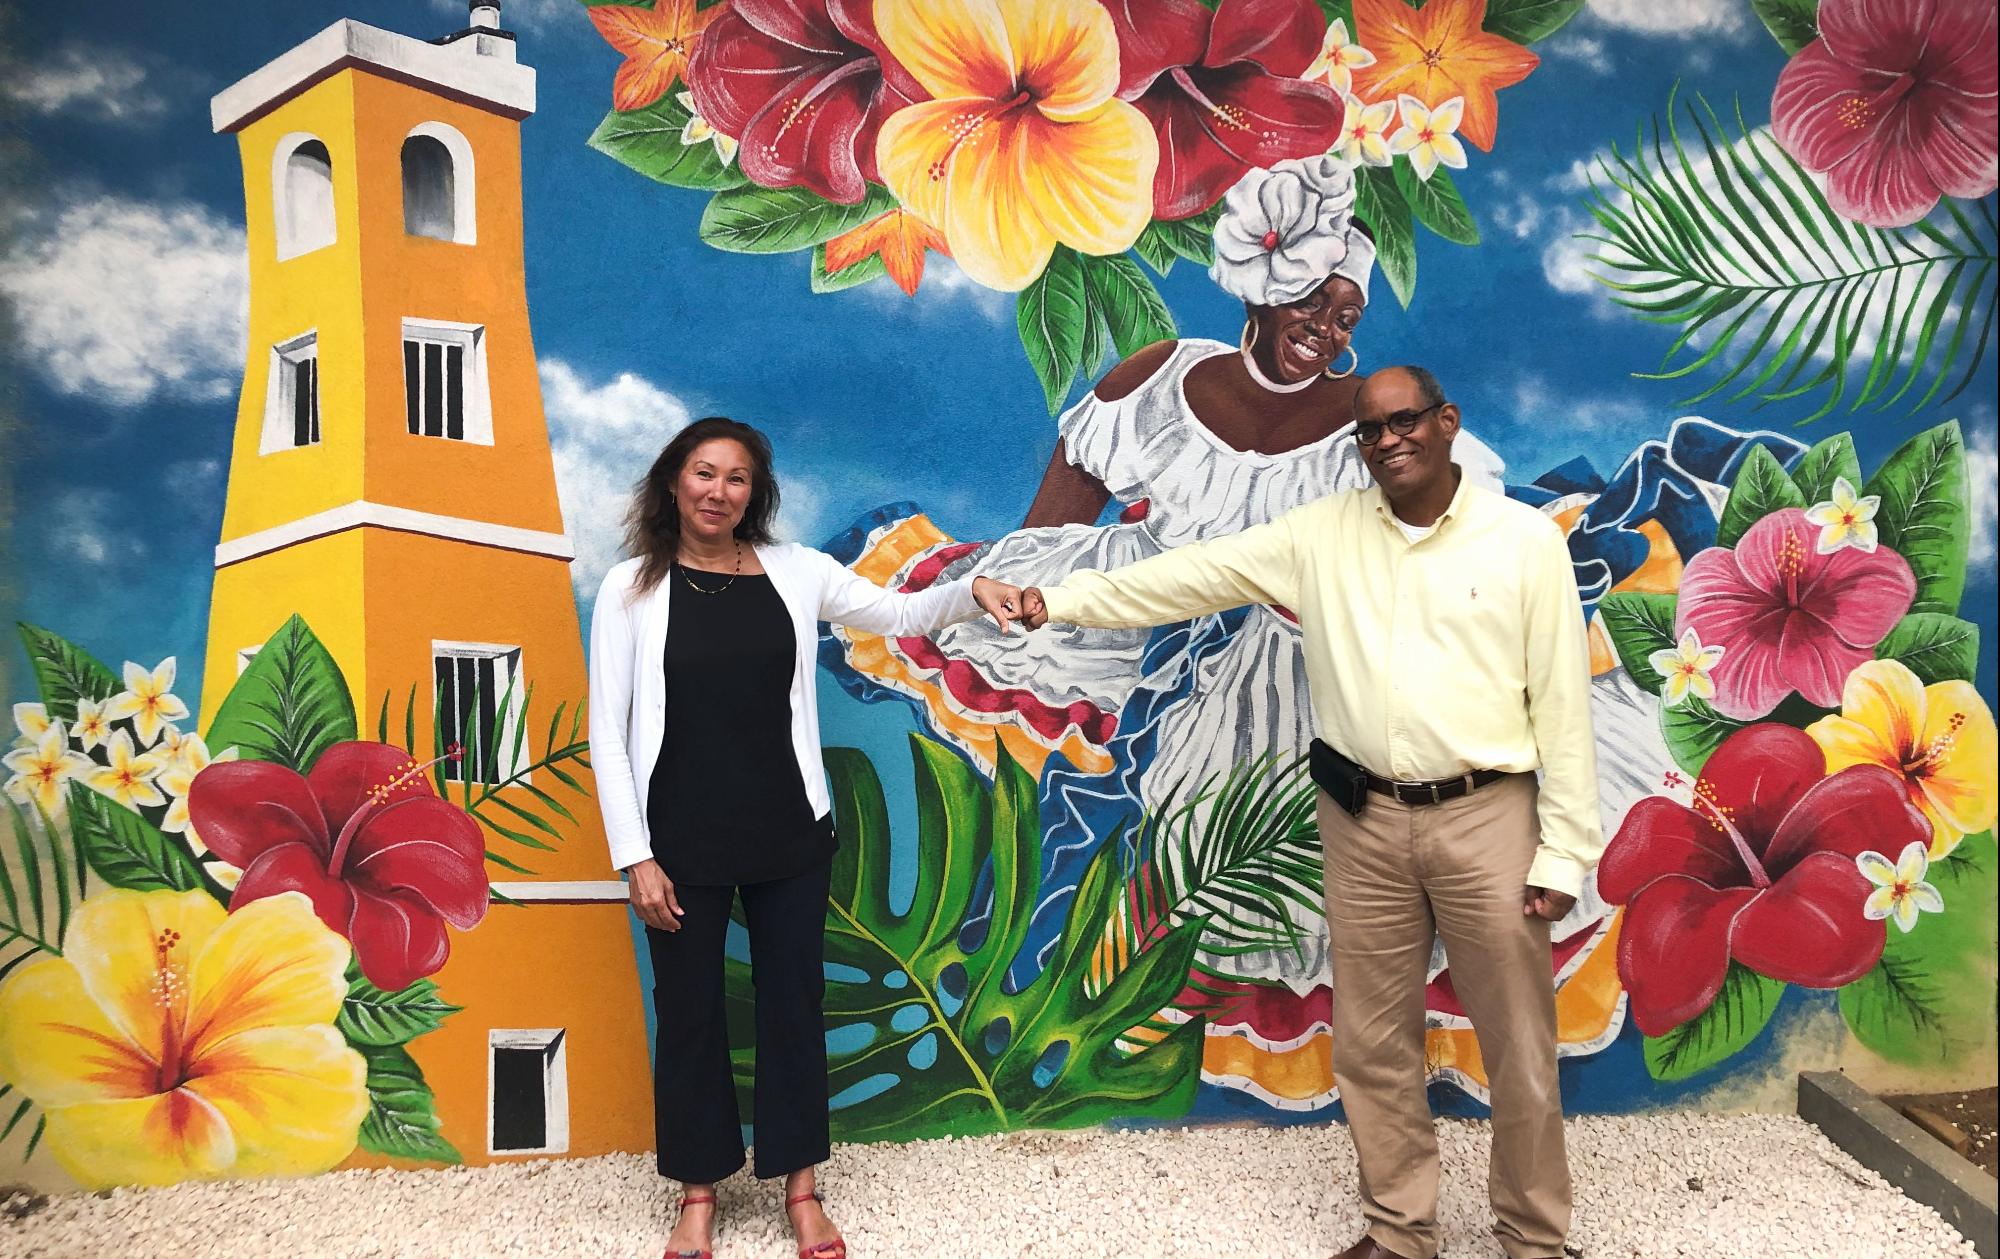 Haarlemse ouderenzorg leert van familiecultuur op Bonaire en andersom. Kennemerhart en Fundashon Mariadal intensiveren samenwerking